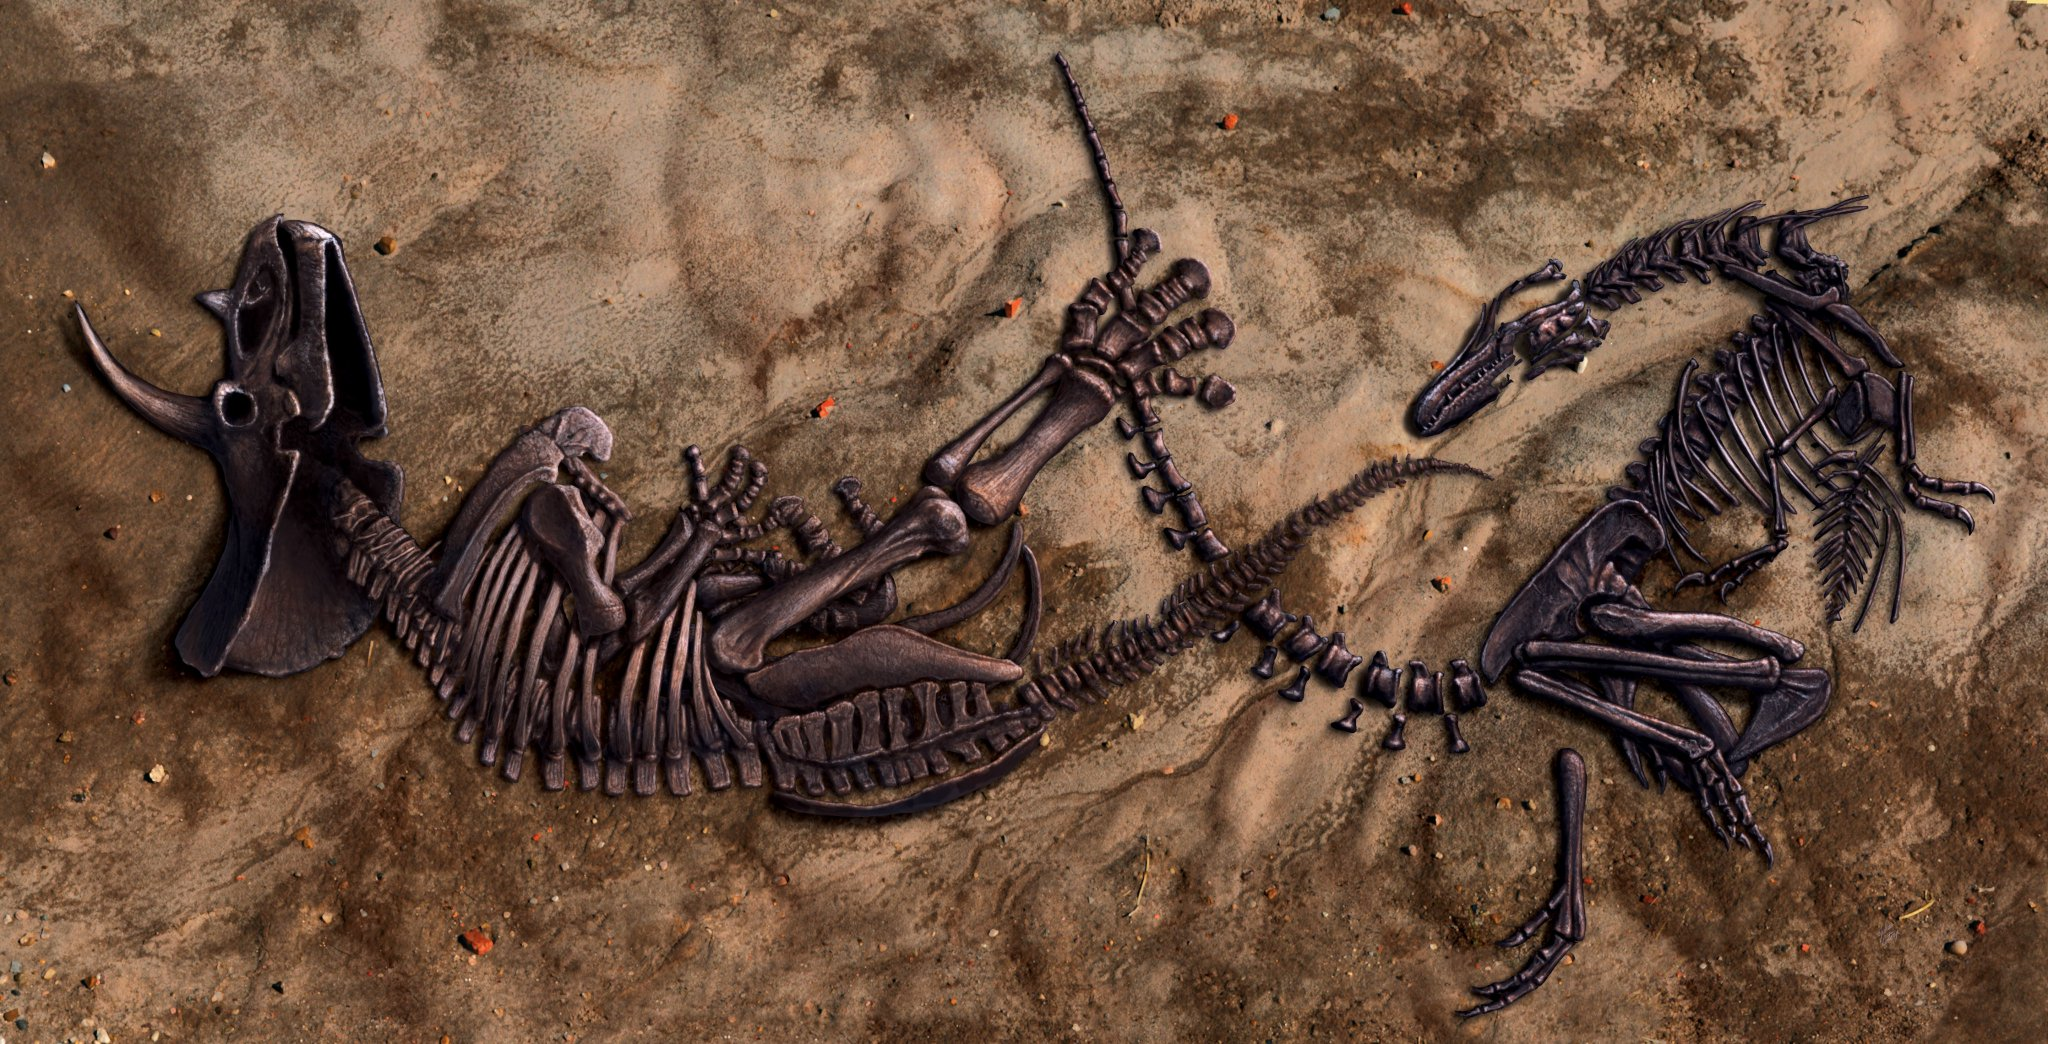 交戰中的兩隻恐龍同時重傷致死並保存為化石。(North Carolina Museum of Natural History)